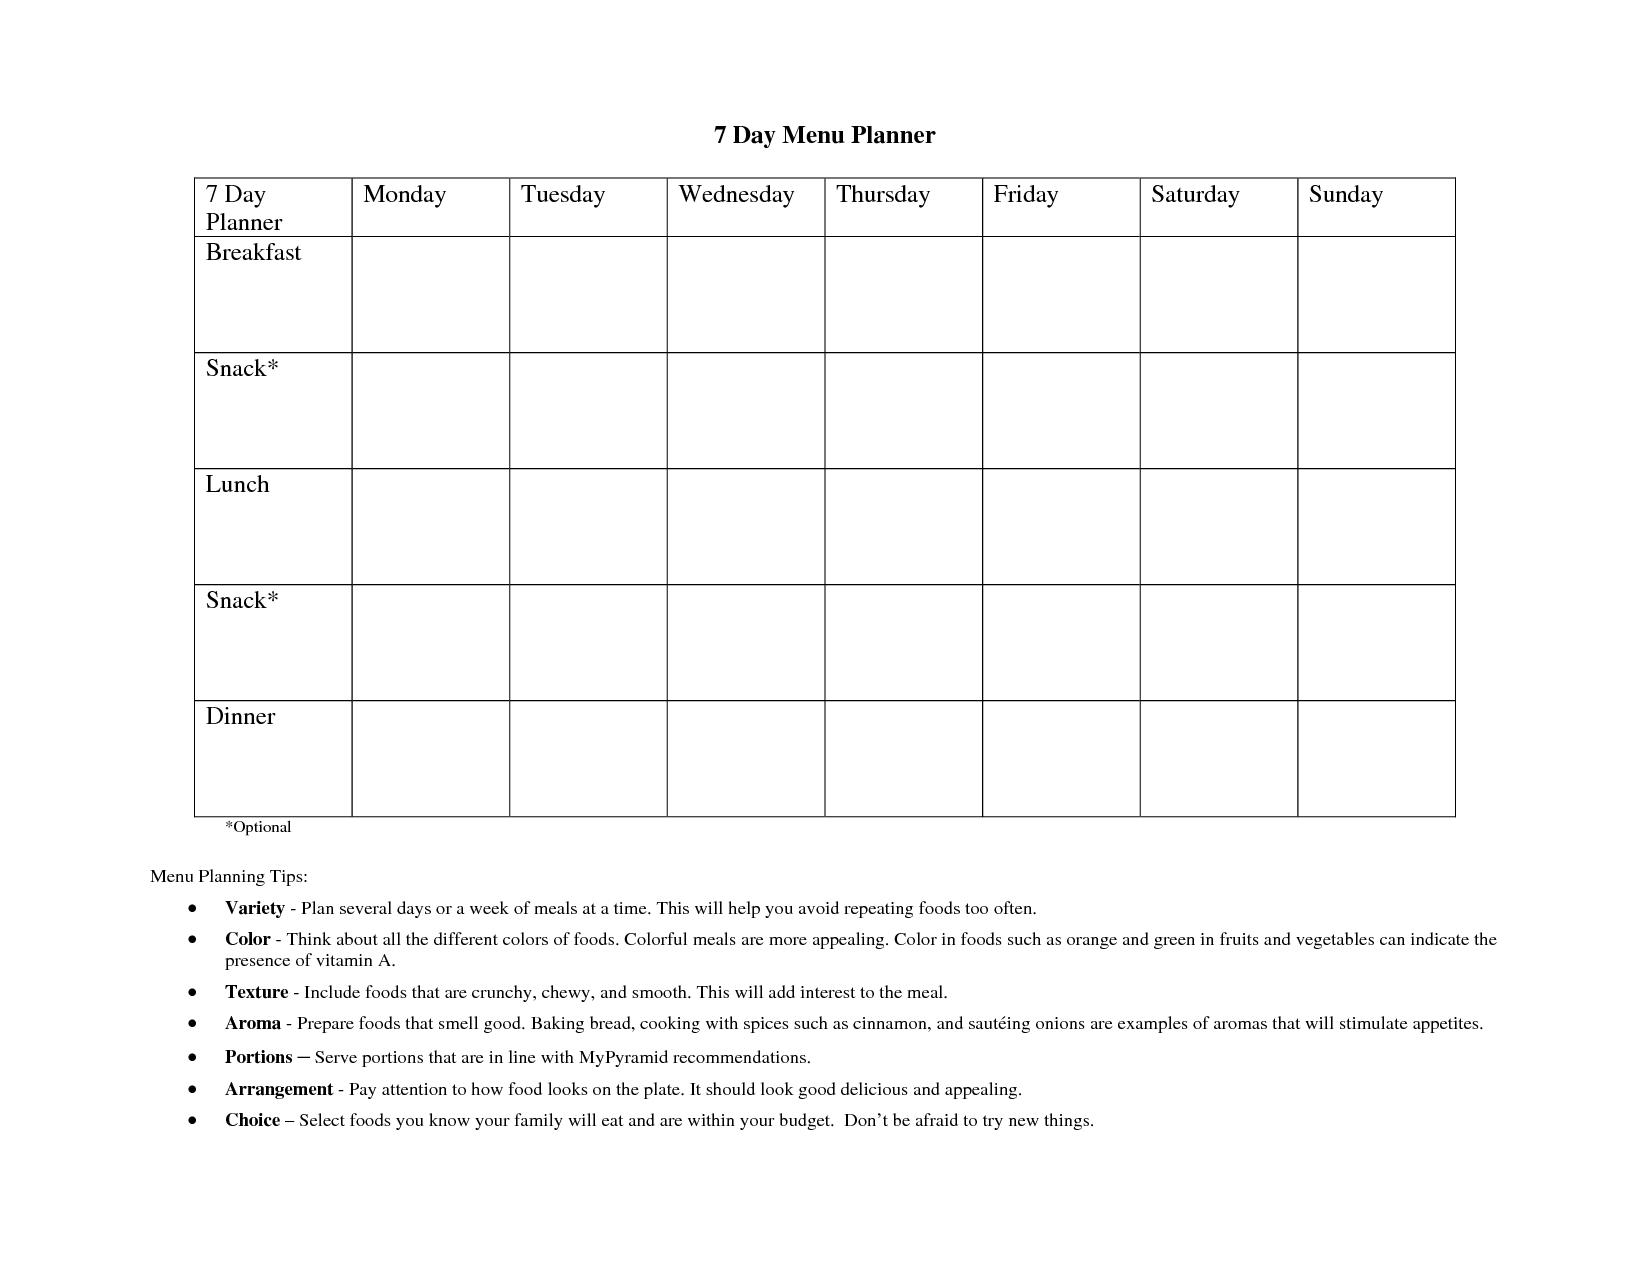 printable 7 day calendar template monday starts with that calendar Free Day To Day Calendar erdferdf